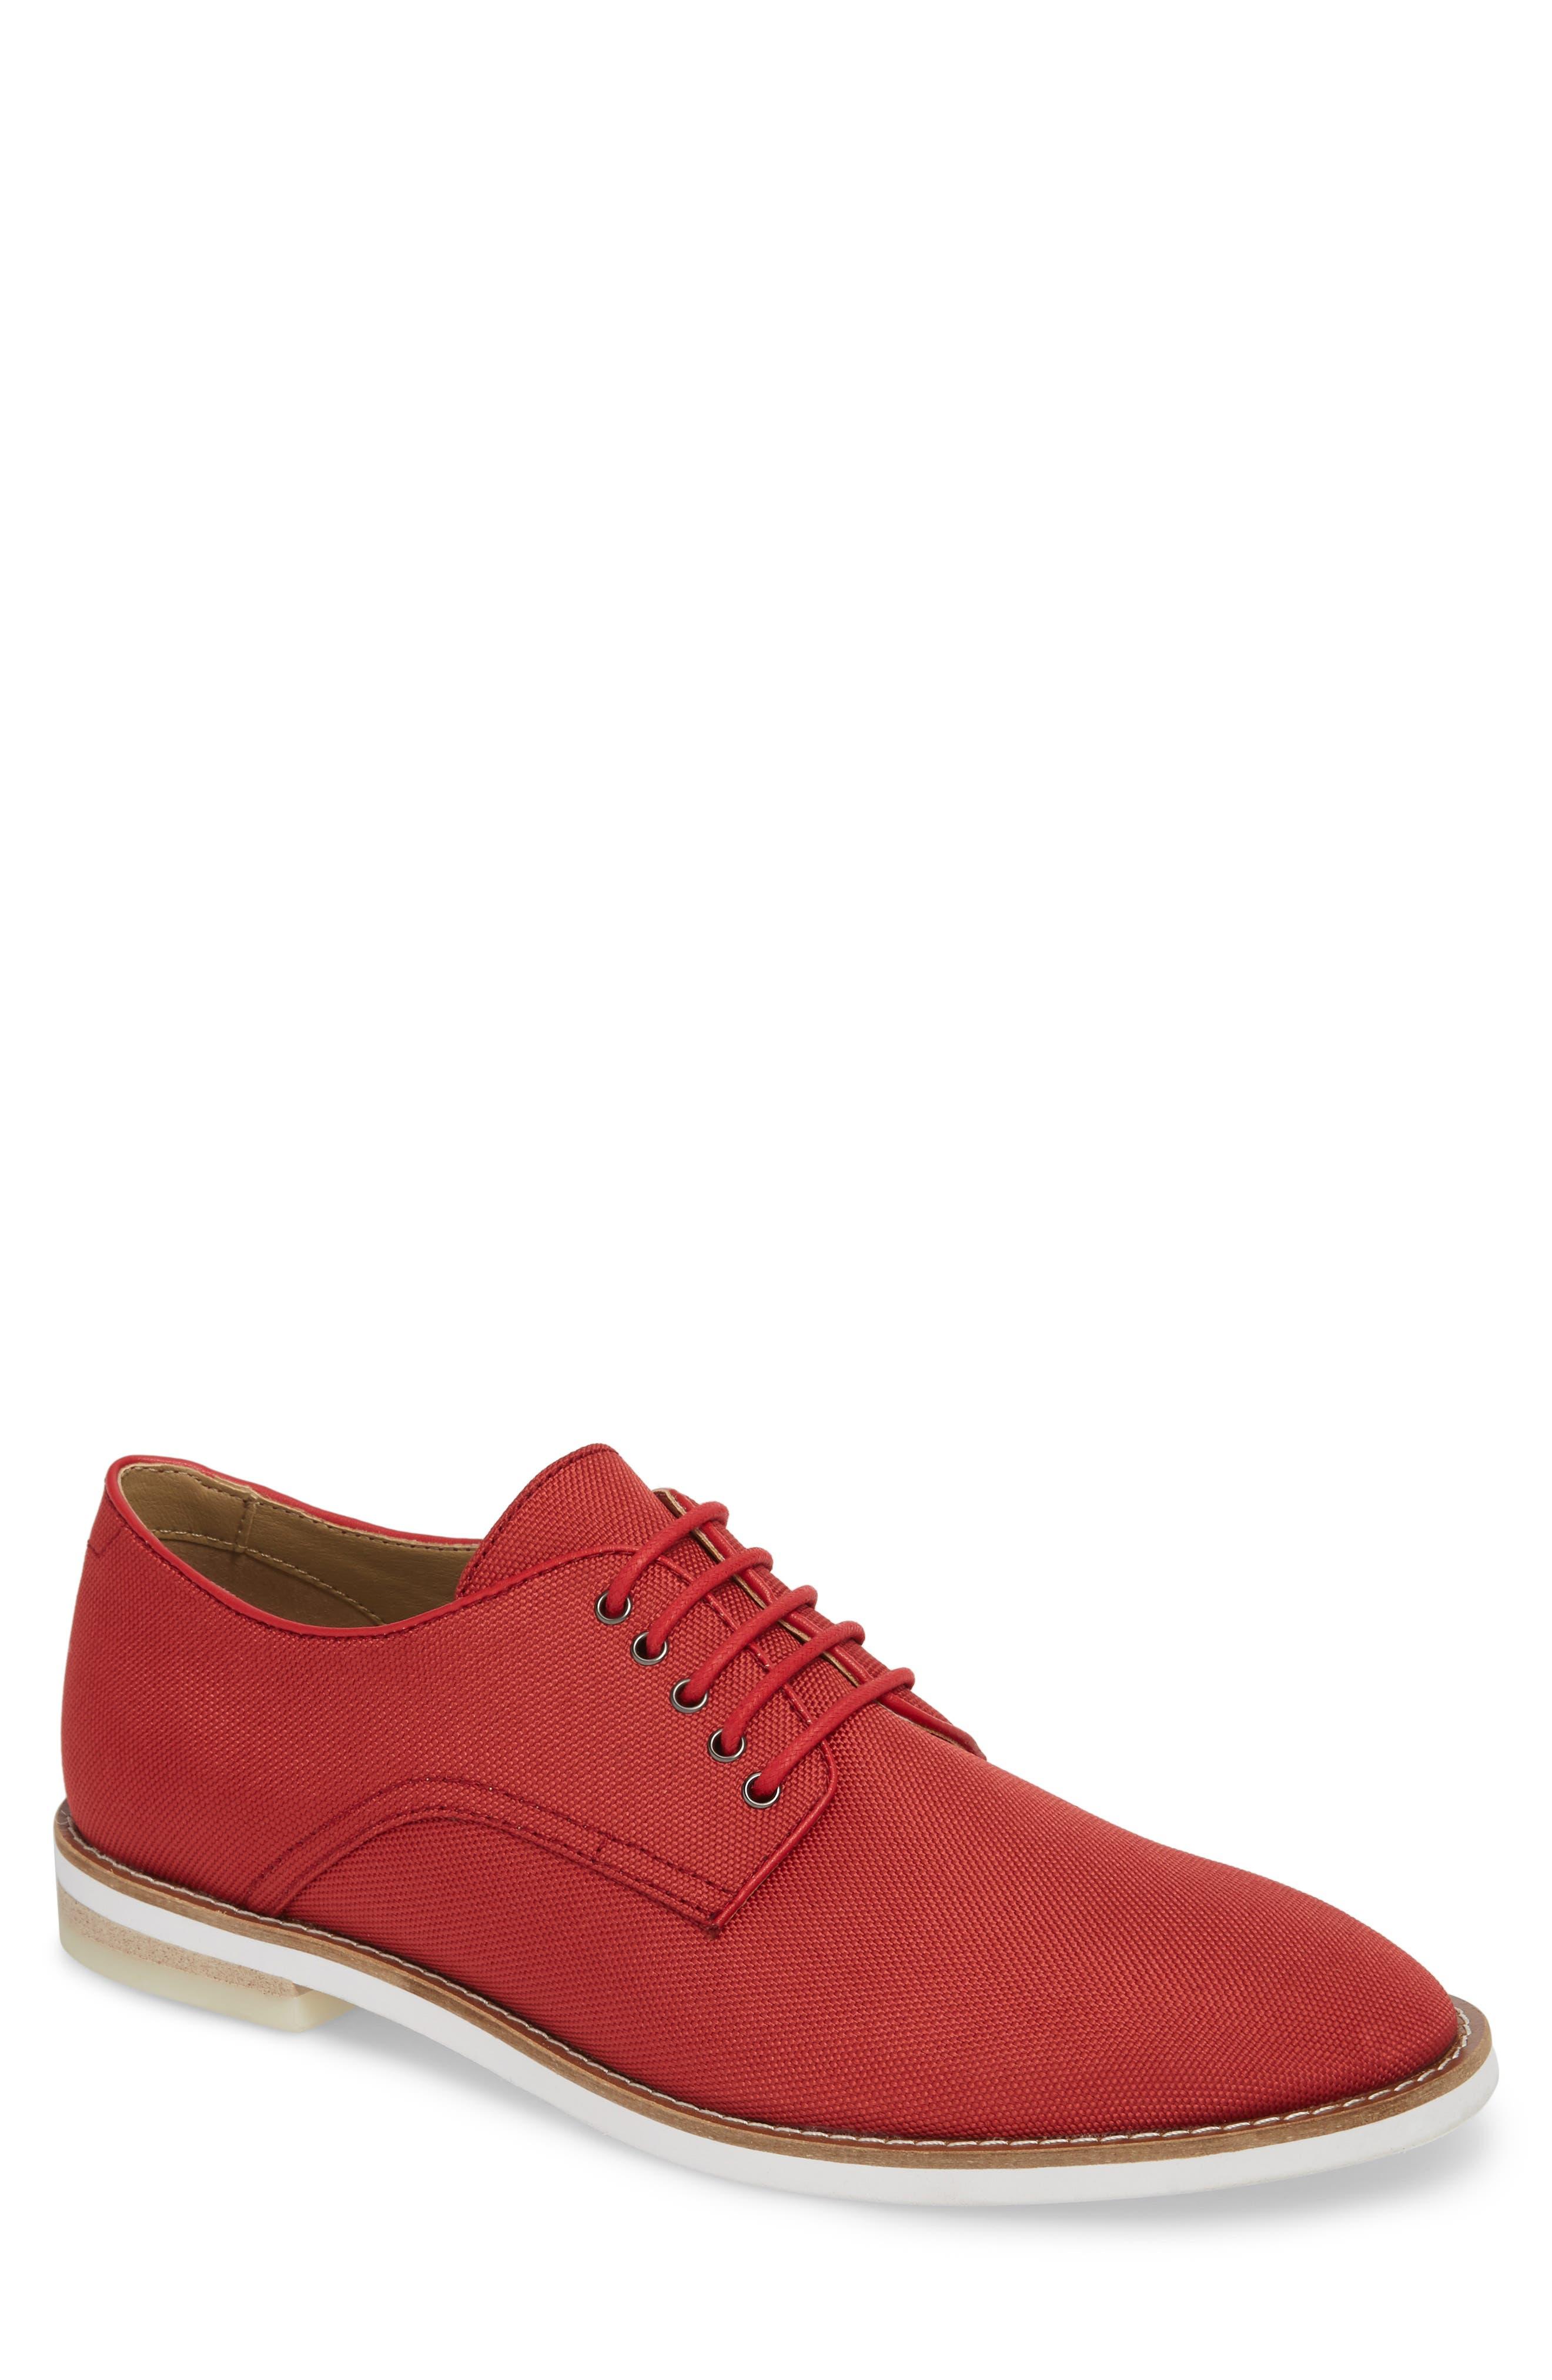 Atlee Plain Toe Derby,                             Main thumbnail 1, color,                             Brick Red Nylon